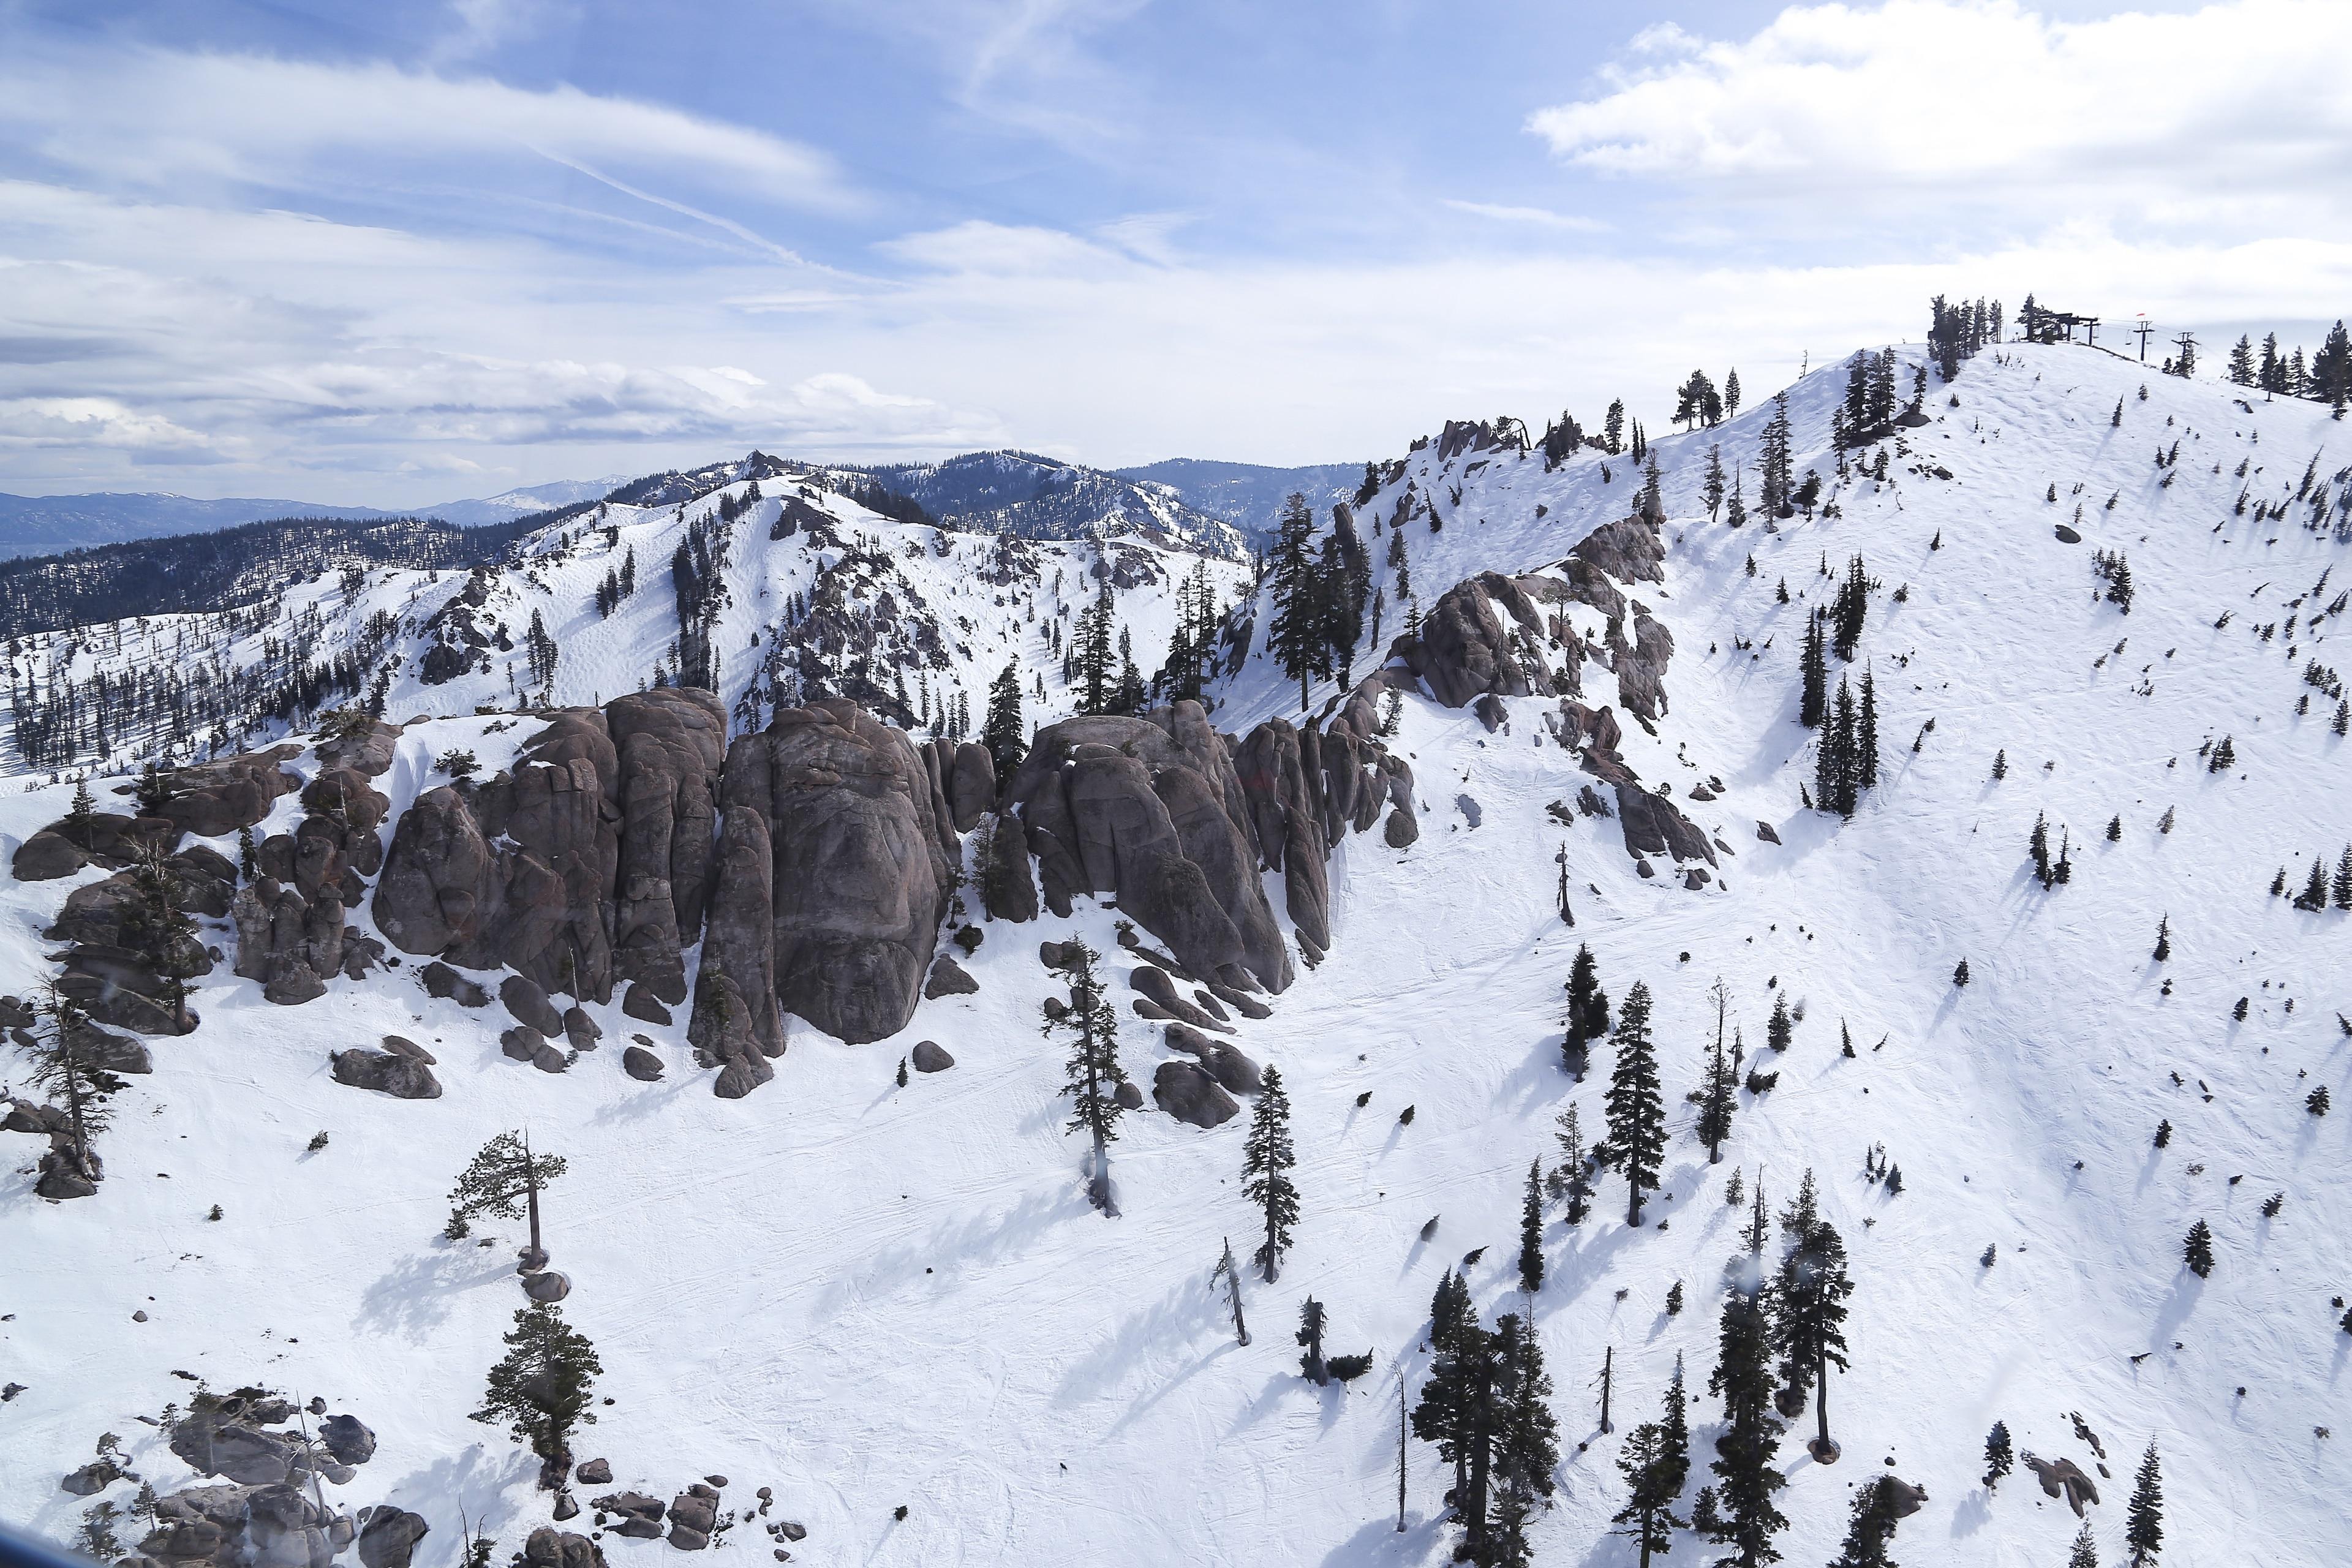 Alpine Meadows, California, United States of America